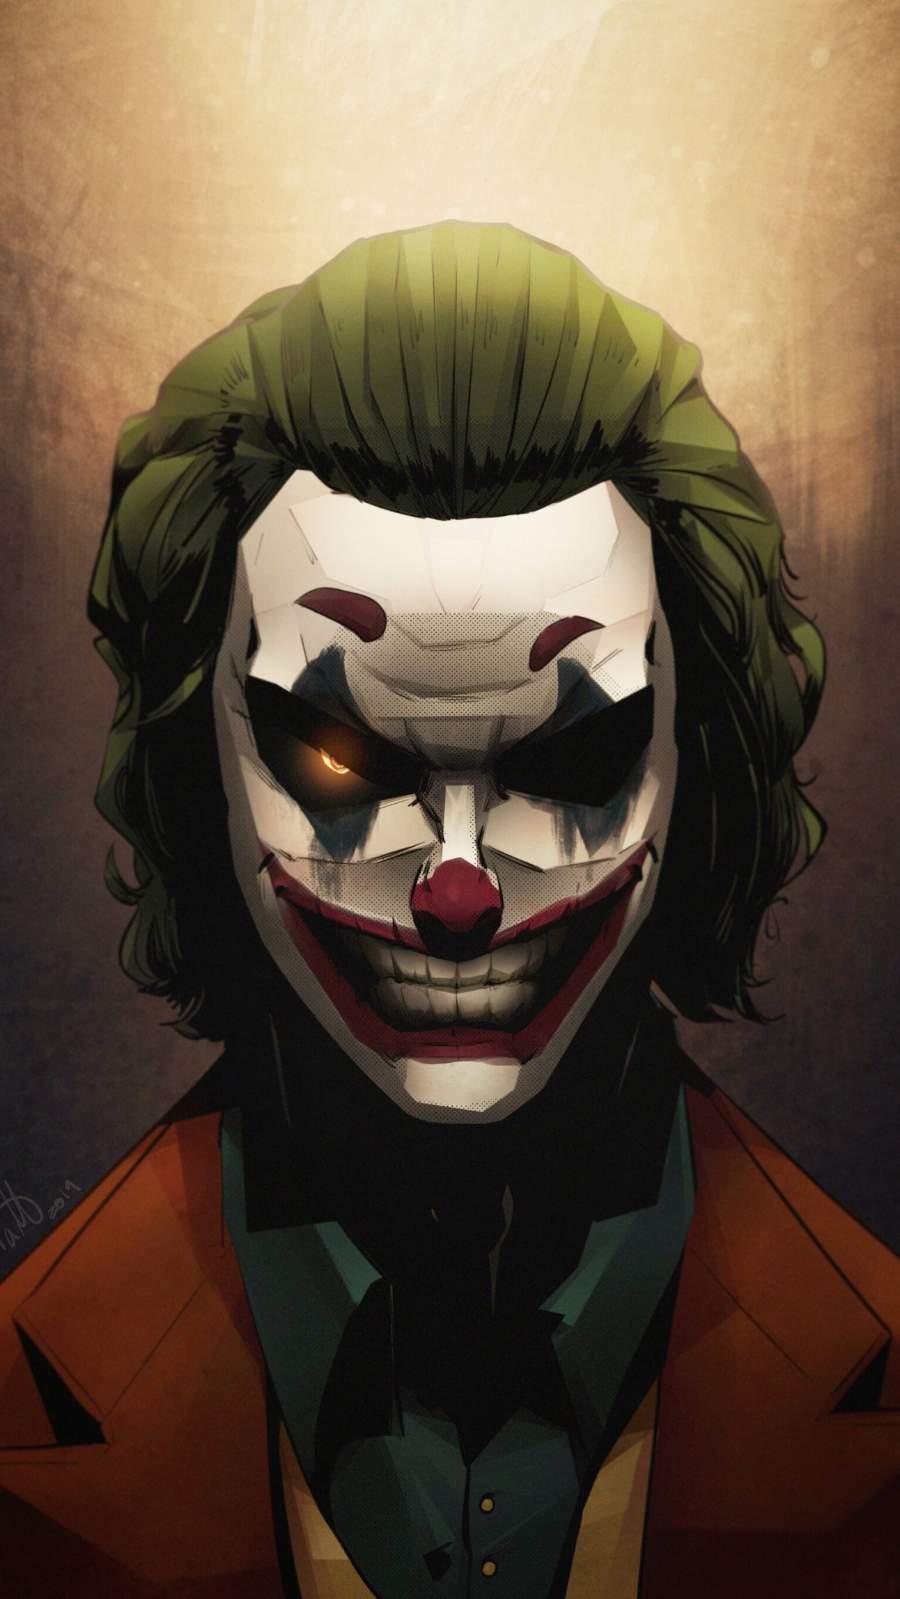 Joker Evil Art iPhone Wallpaper